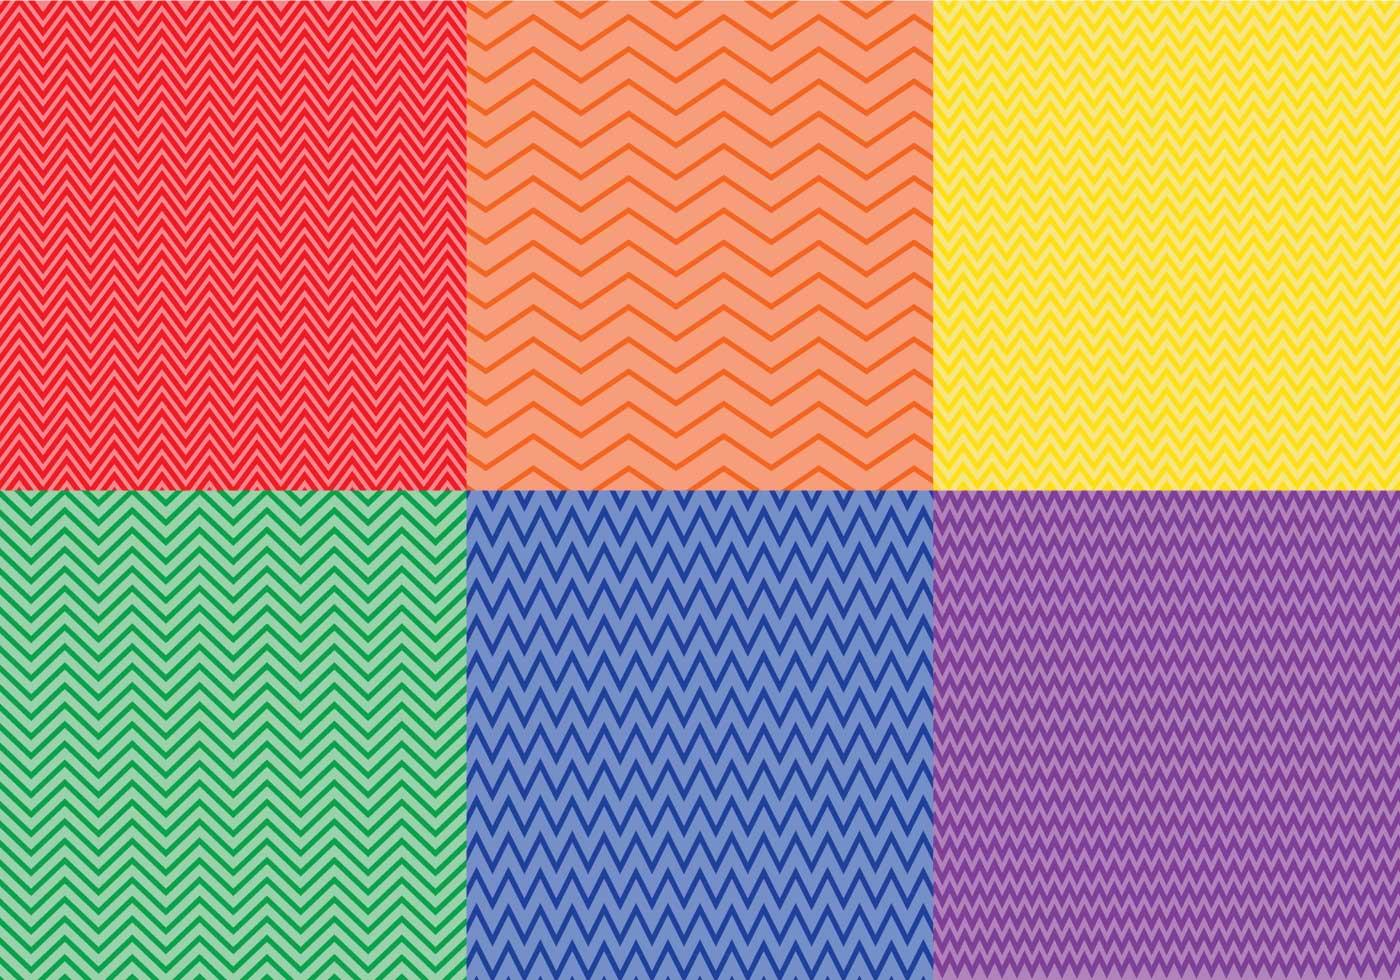 zig zag background vectors download free vector art stock graphics images. Black Bedroom Furniture Sets. Home Design Ideas